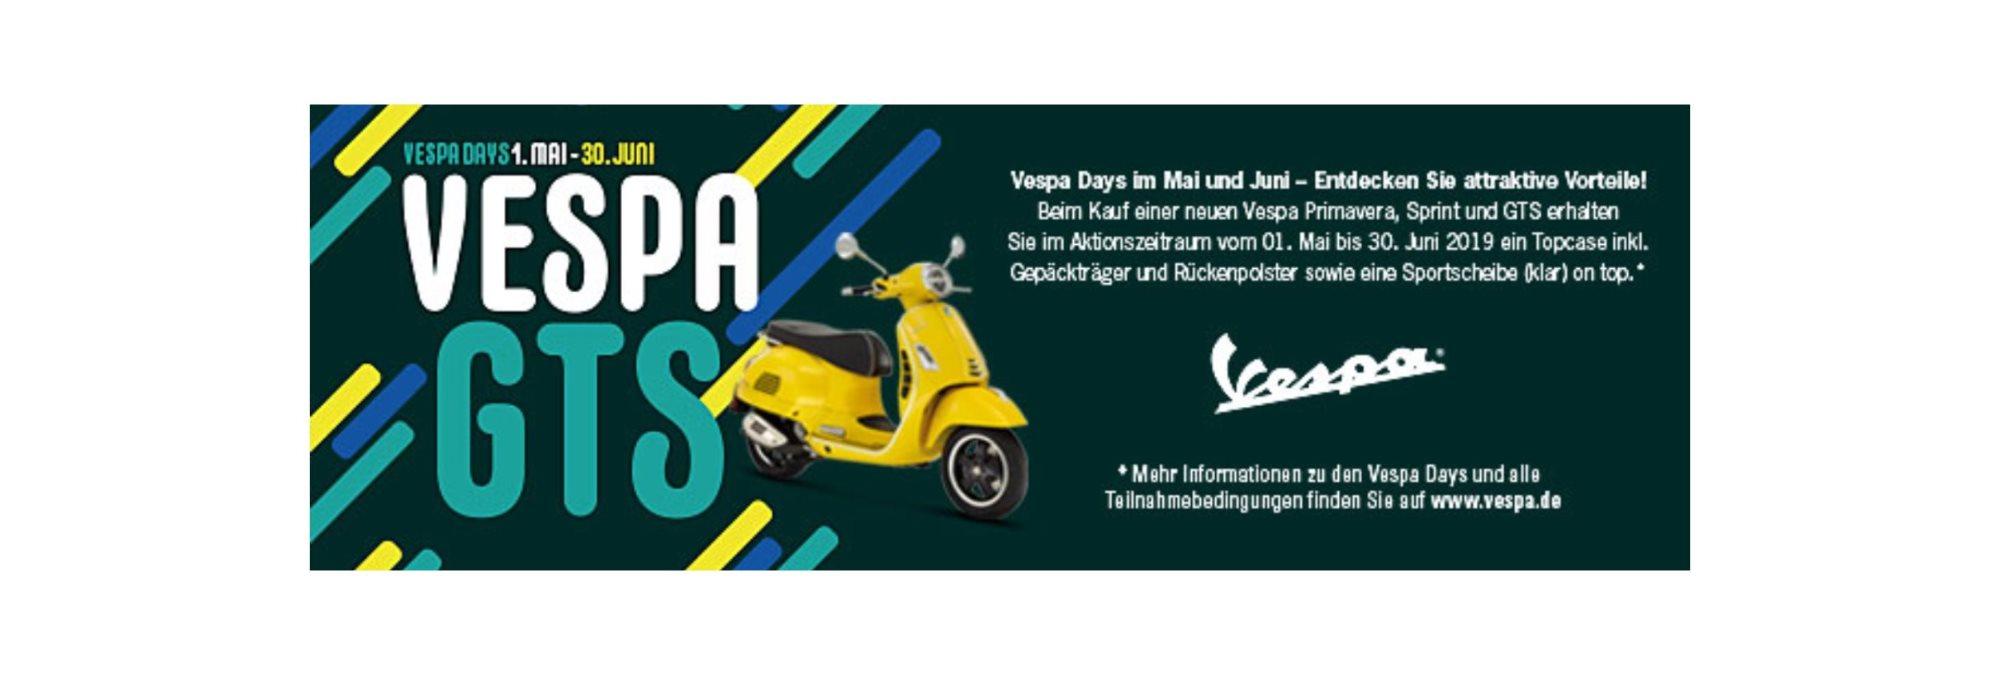 Vespa Days GTS